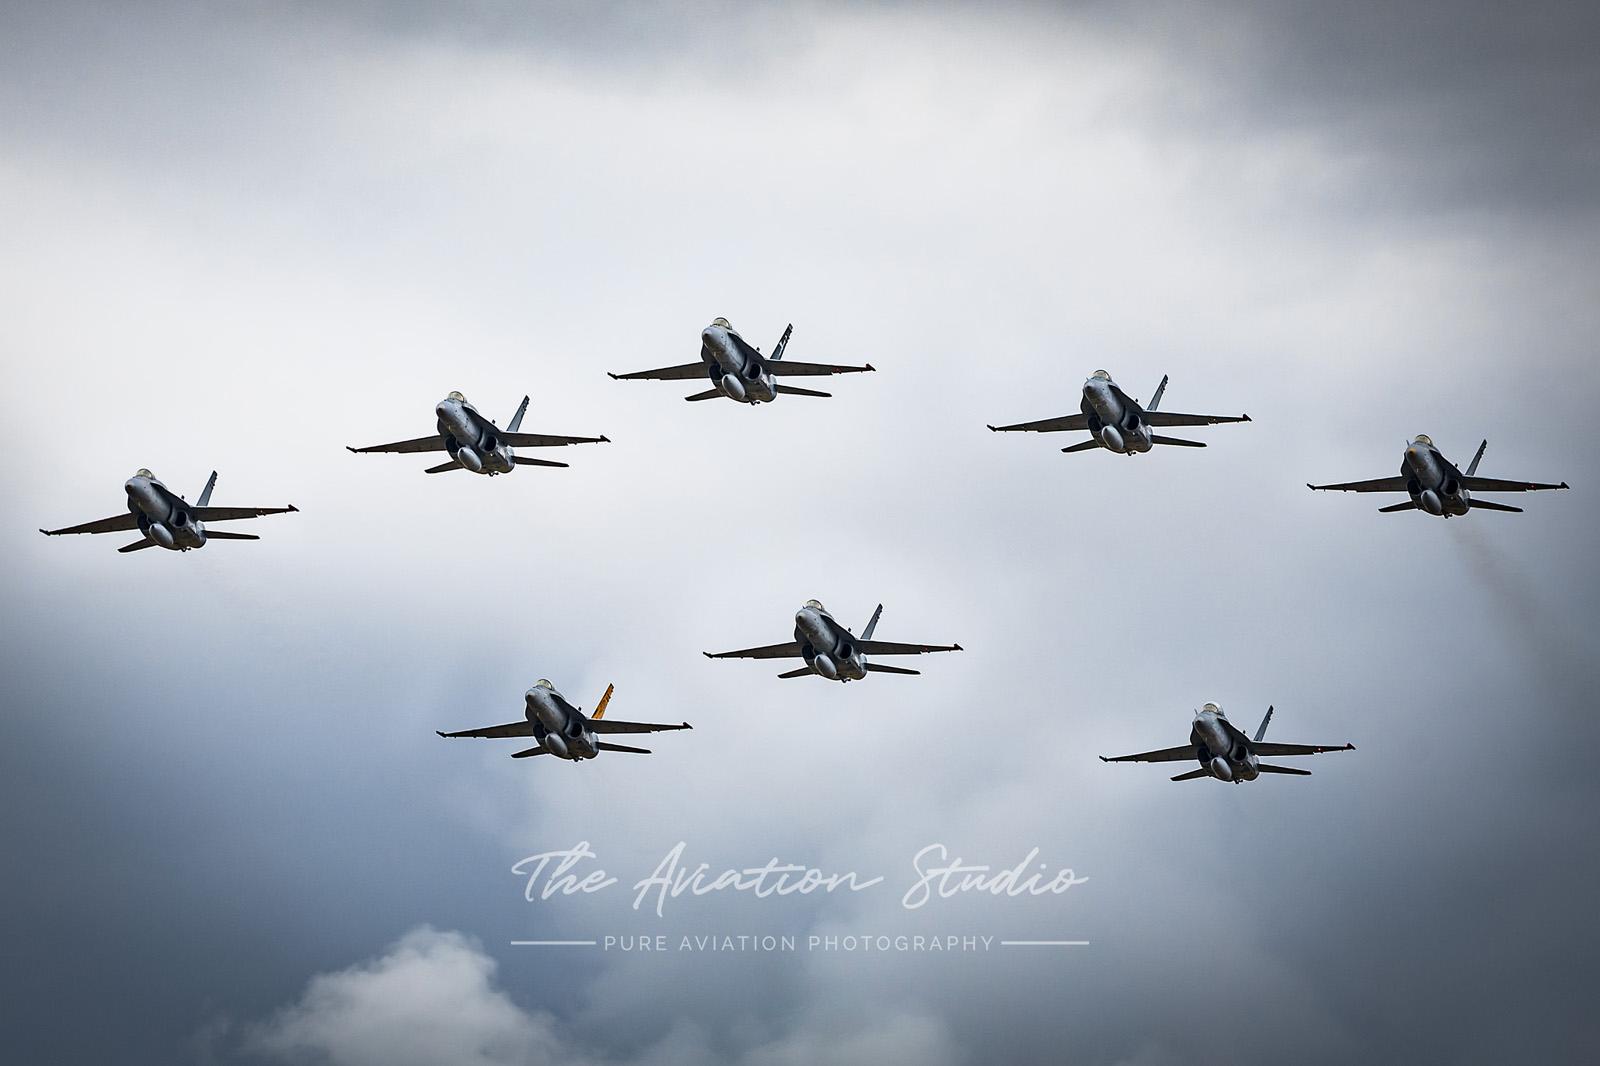 The Aviation Studio